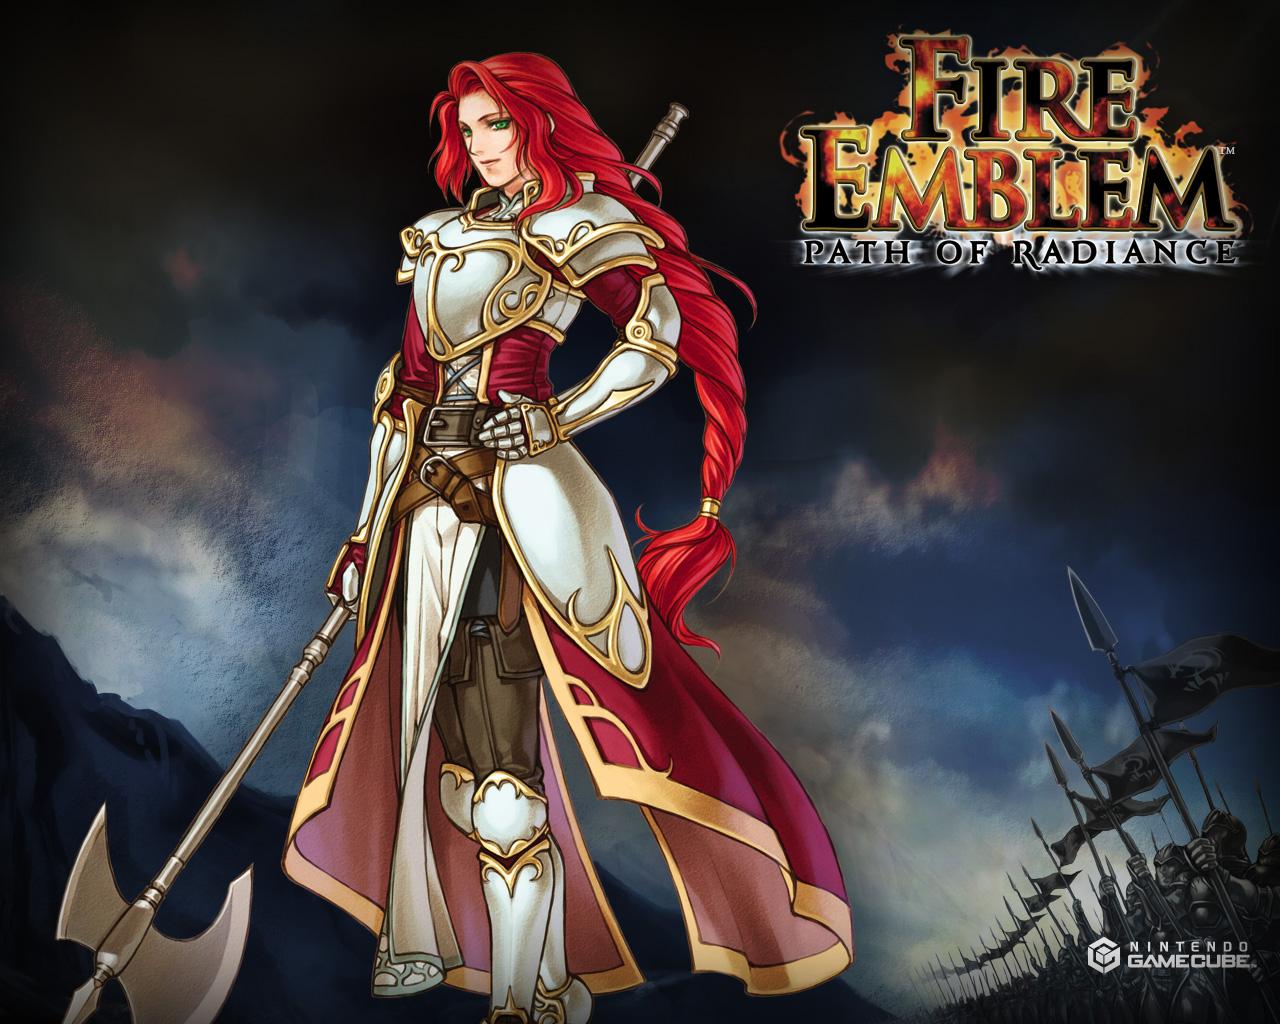 fire emblem path of radiance fiche rpg reviews previews